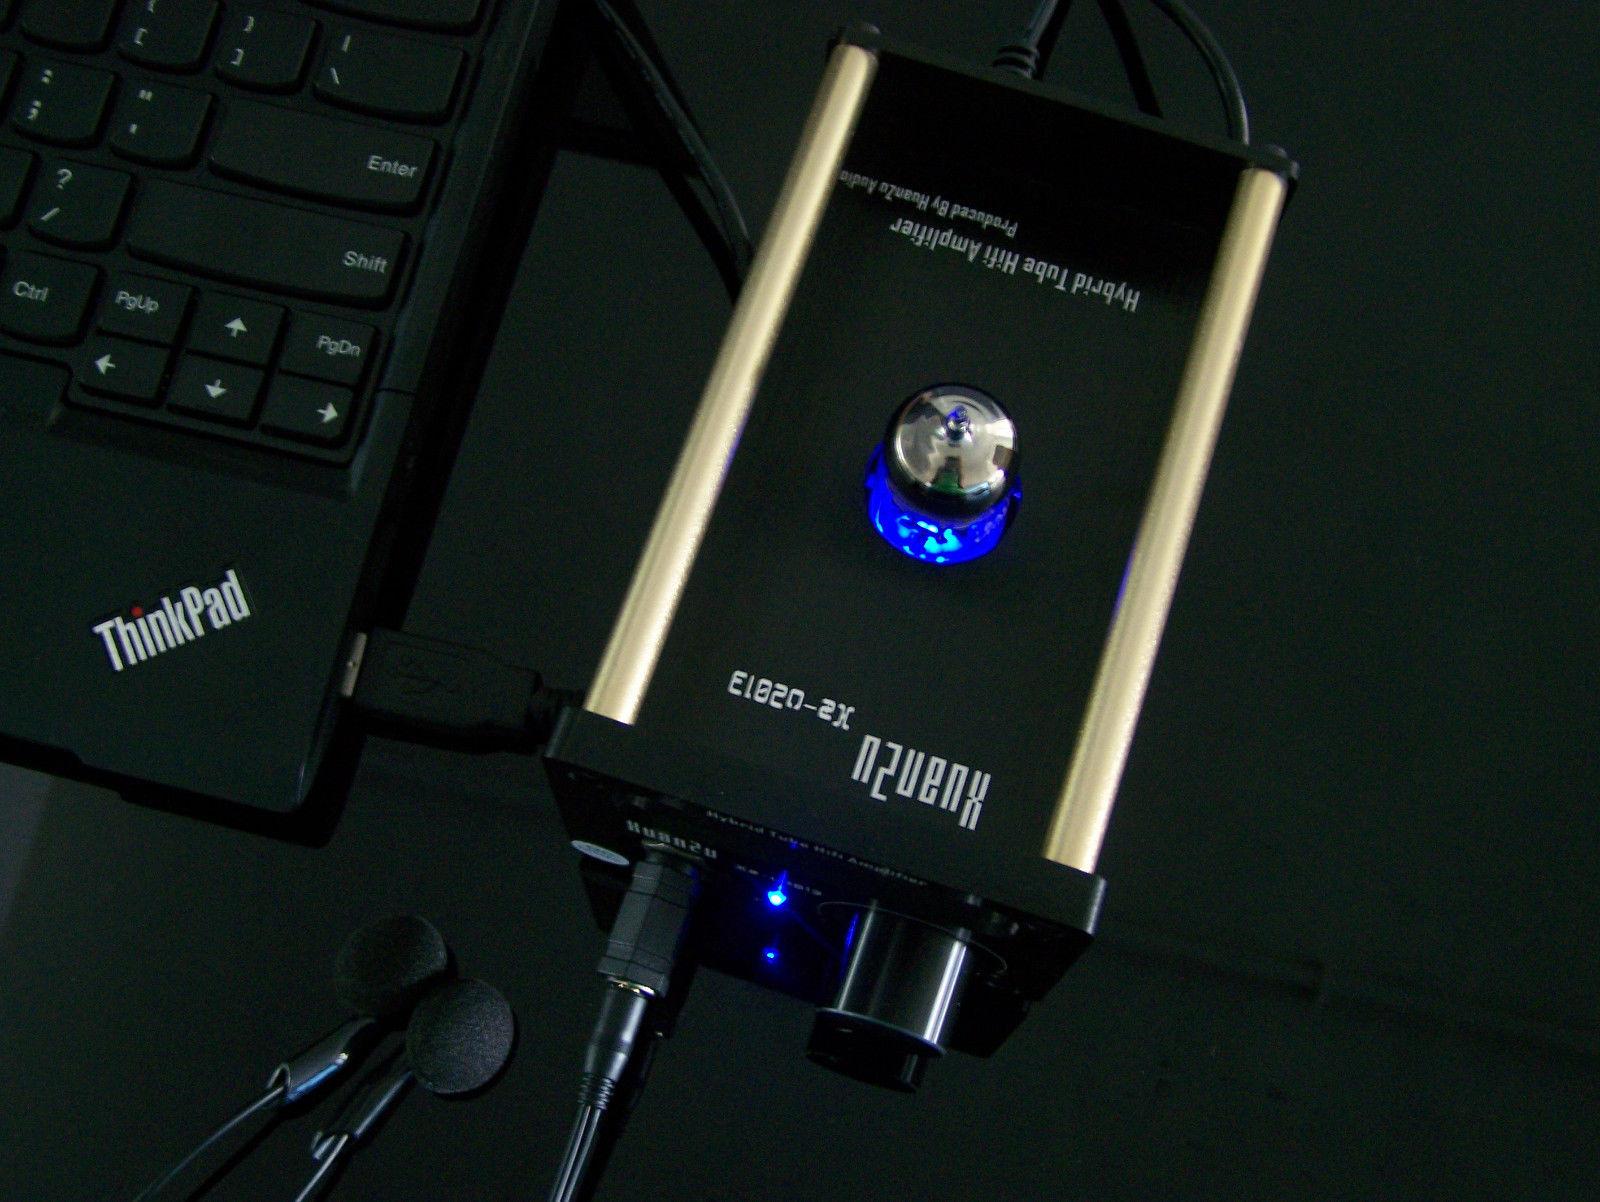 GZLOZON EHifi Class A 6N11 Tube headphone amplifier / Tube preamp / USB DAC L3-53 low price new dc24v hi fi class a 6n11 tube headphone amplifier integrated circuits